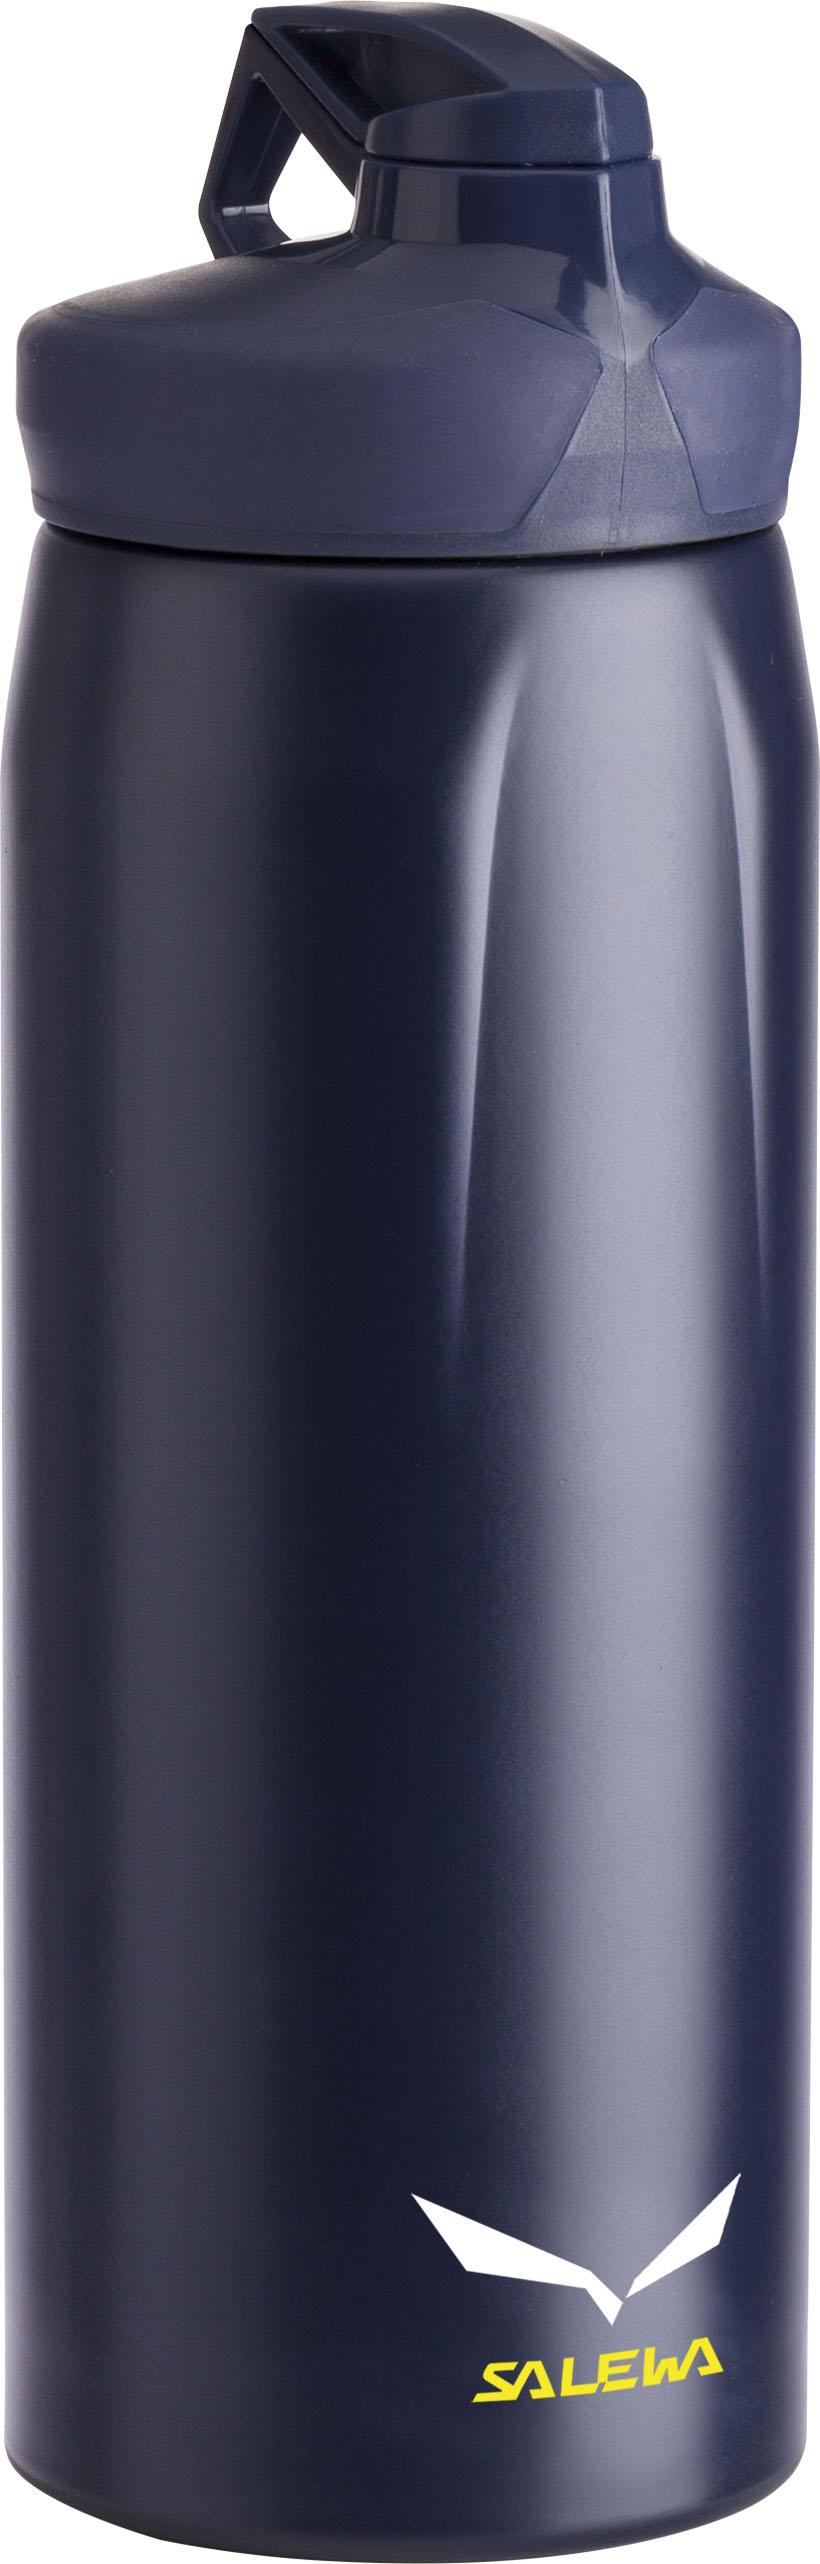 Фляга Salewa Bottles HIKER BOTTLE 0,75 L NAVY / - артикул: 715670170